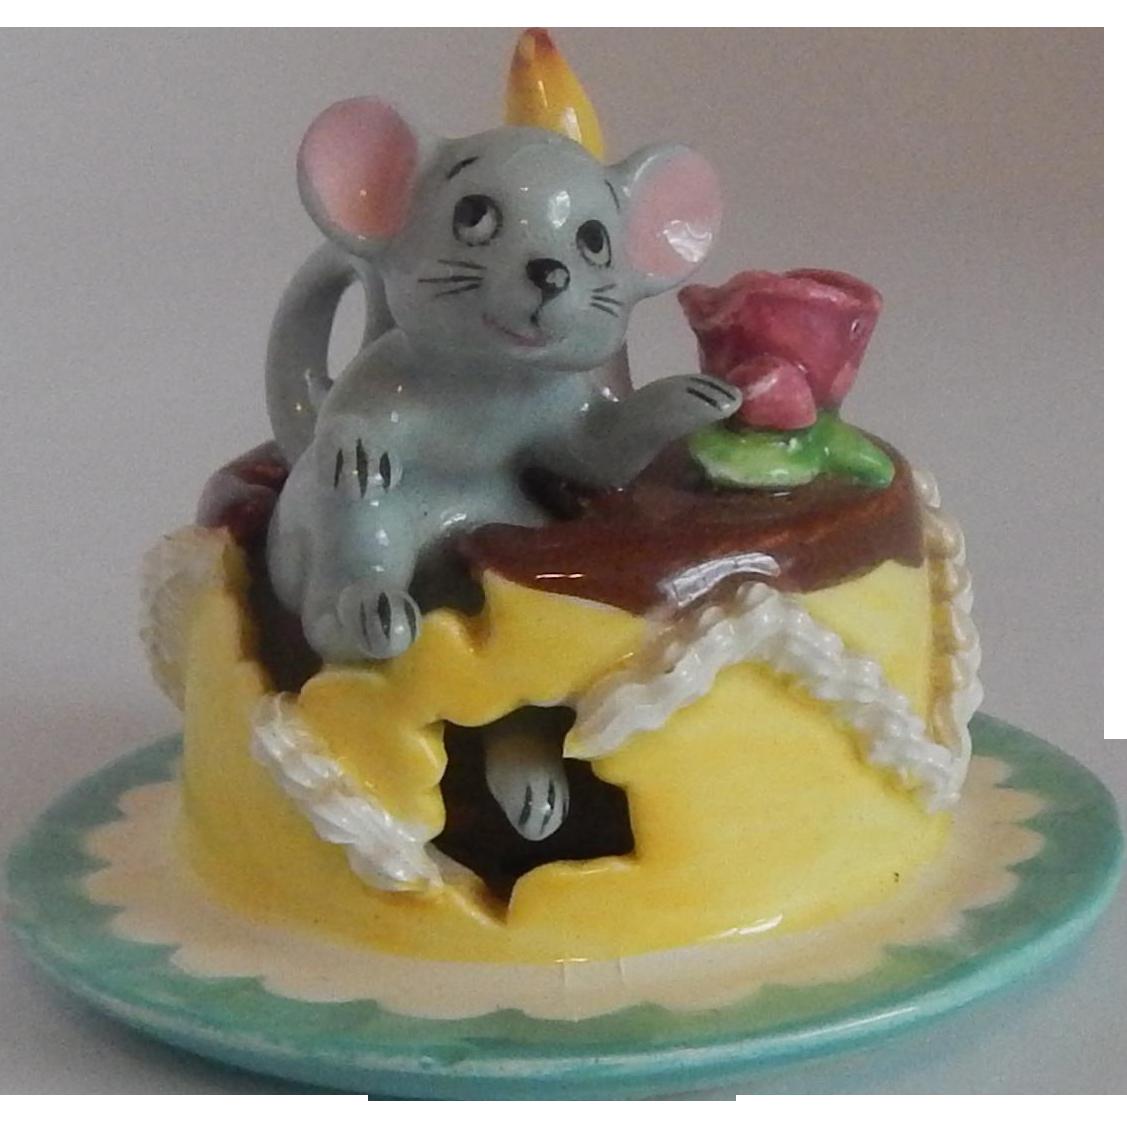 Lipper & Mann Mouse Birthday Cake Figurine